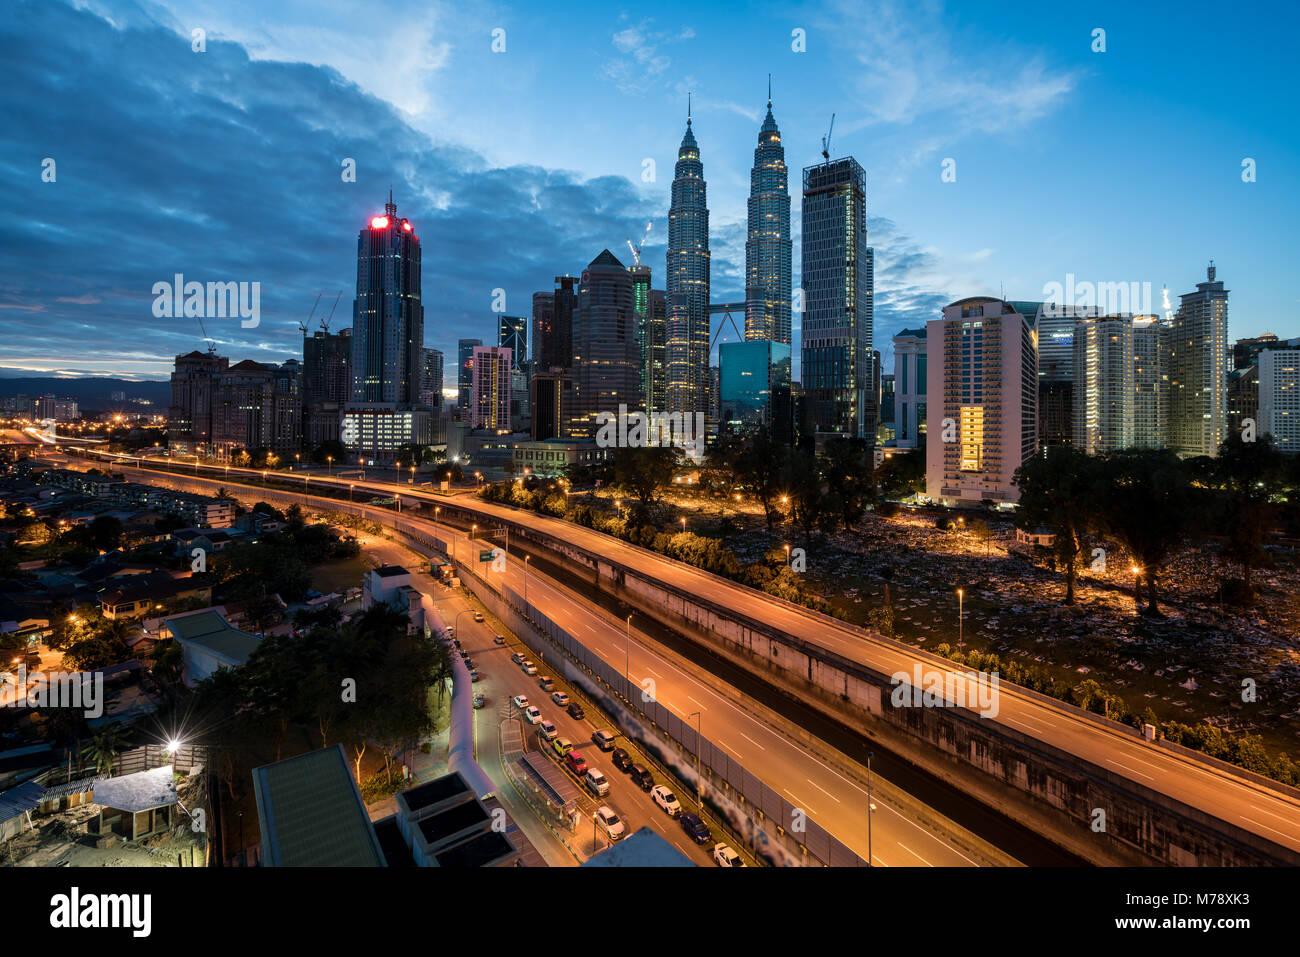 Kuala Lumpur Skyline und Wolkenkratzer mit Autobahn Straße in der Nacht in Kuala Lumpur, Malaysia. Asien. Stockbild